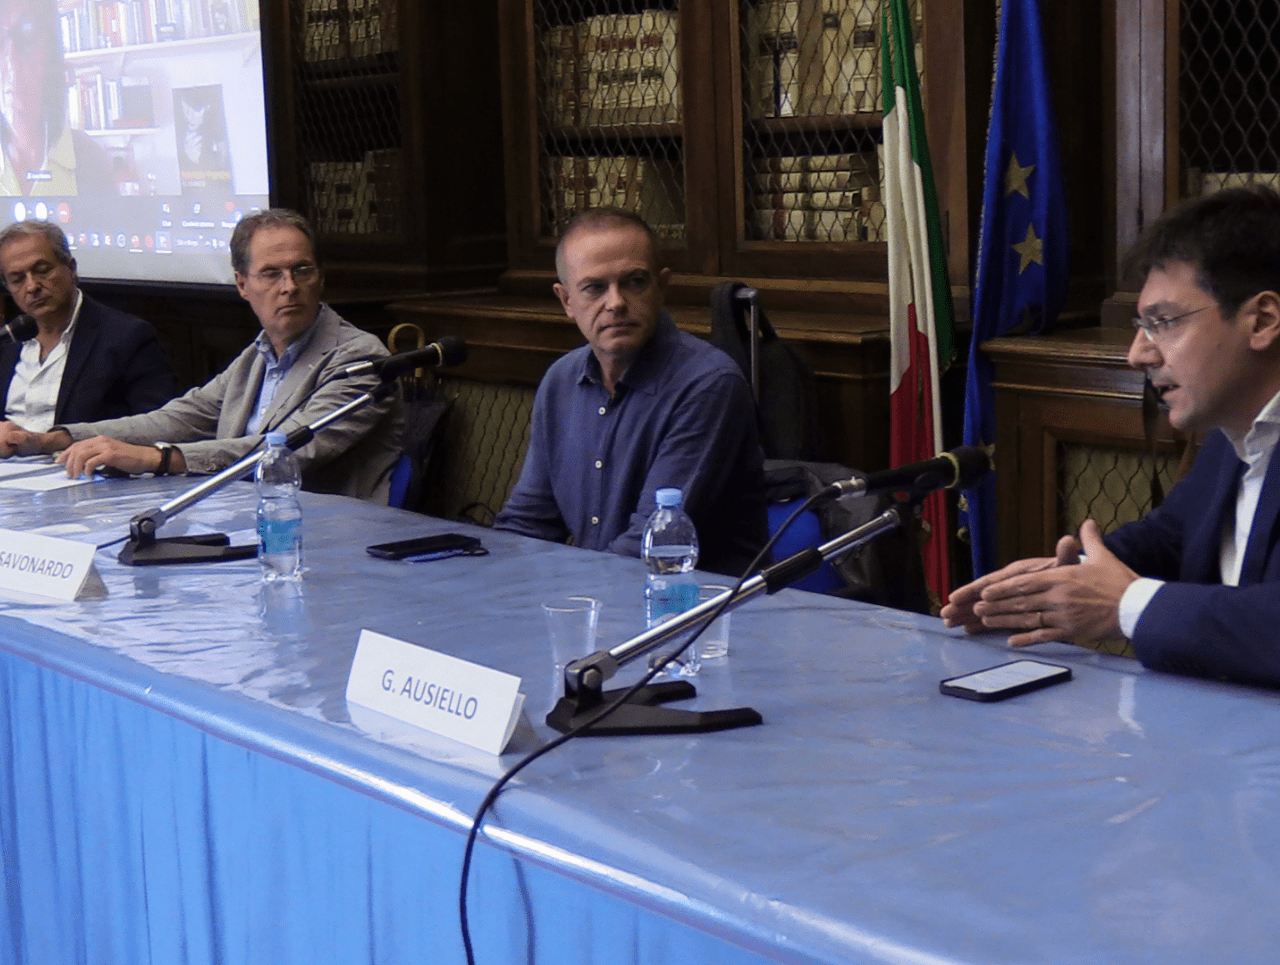 The Fall of Journalism, Napoli - Foto di Daniele Pallotta